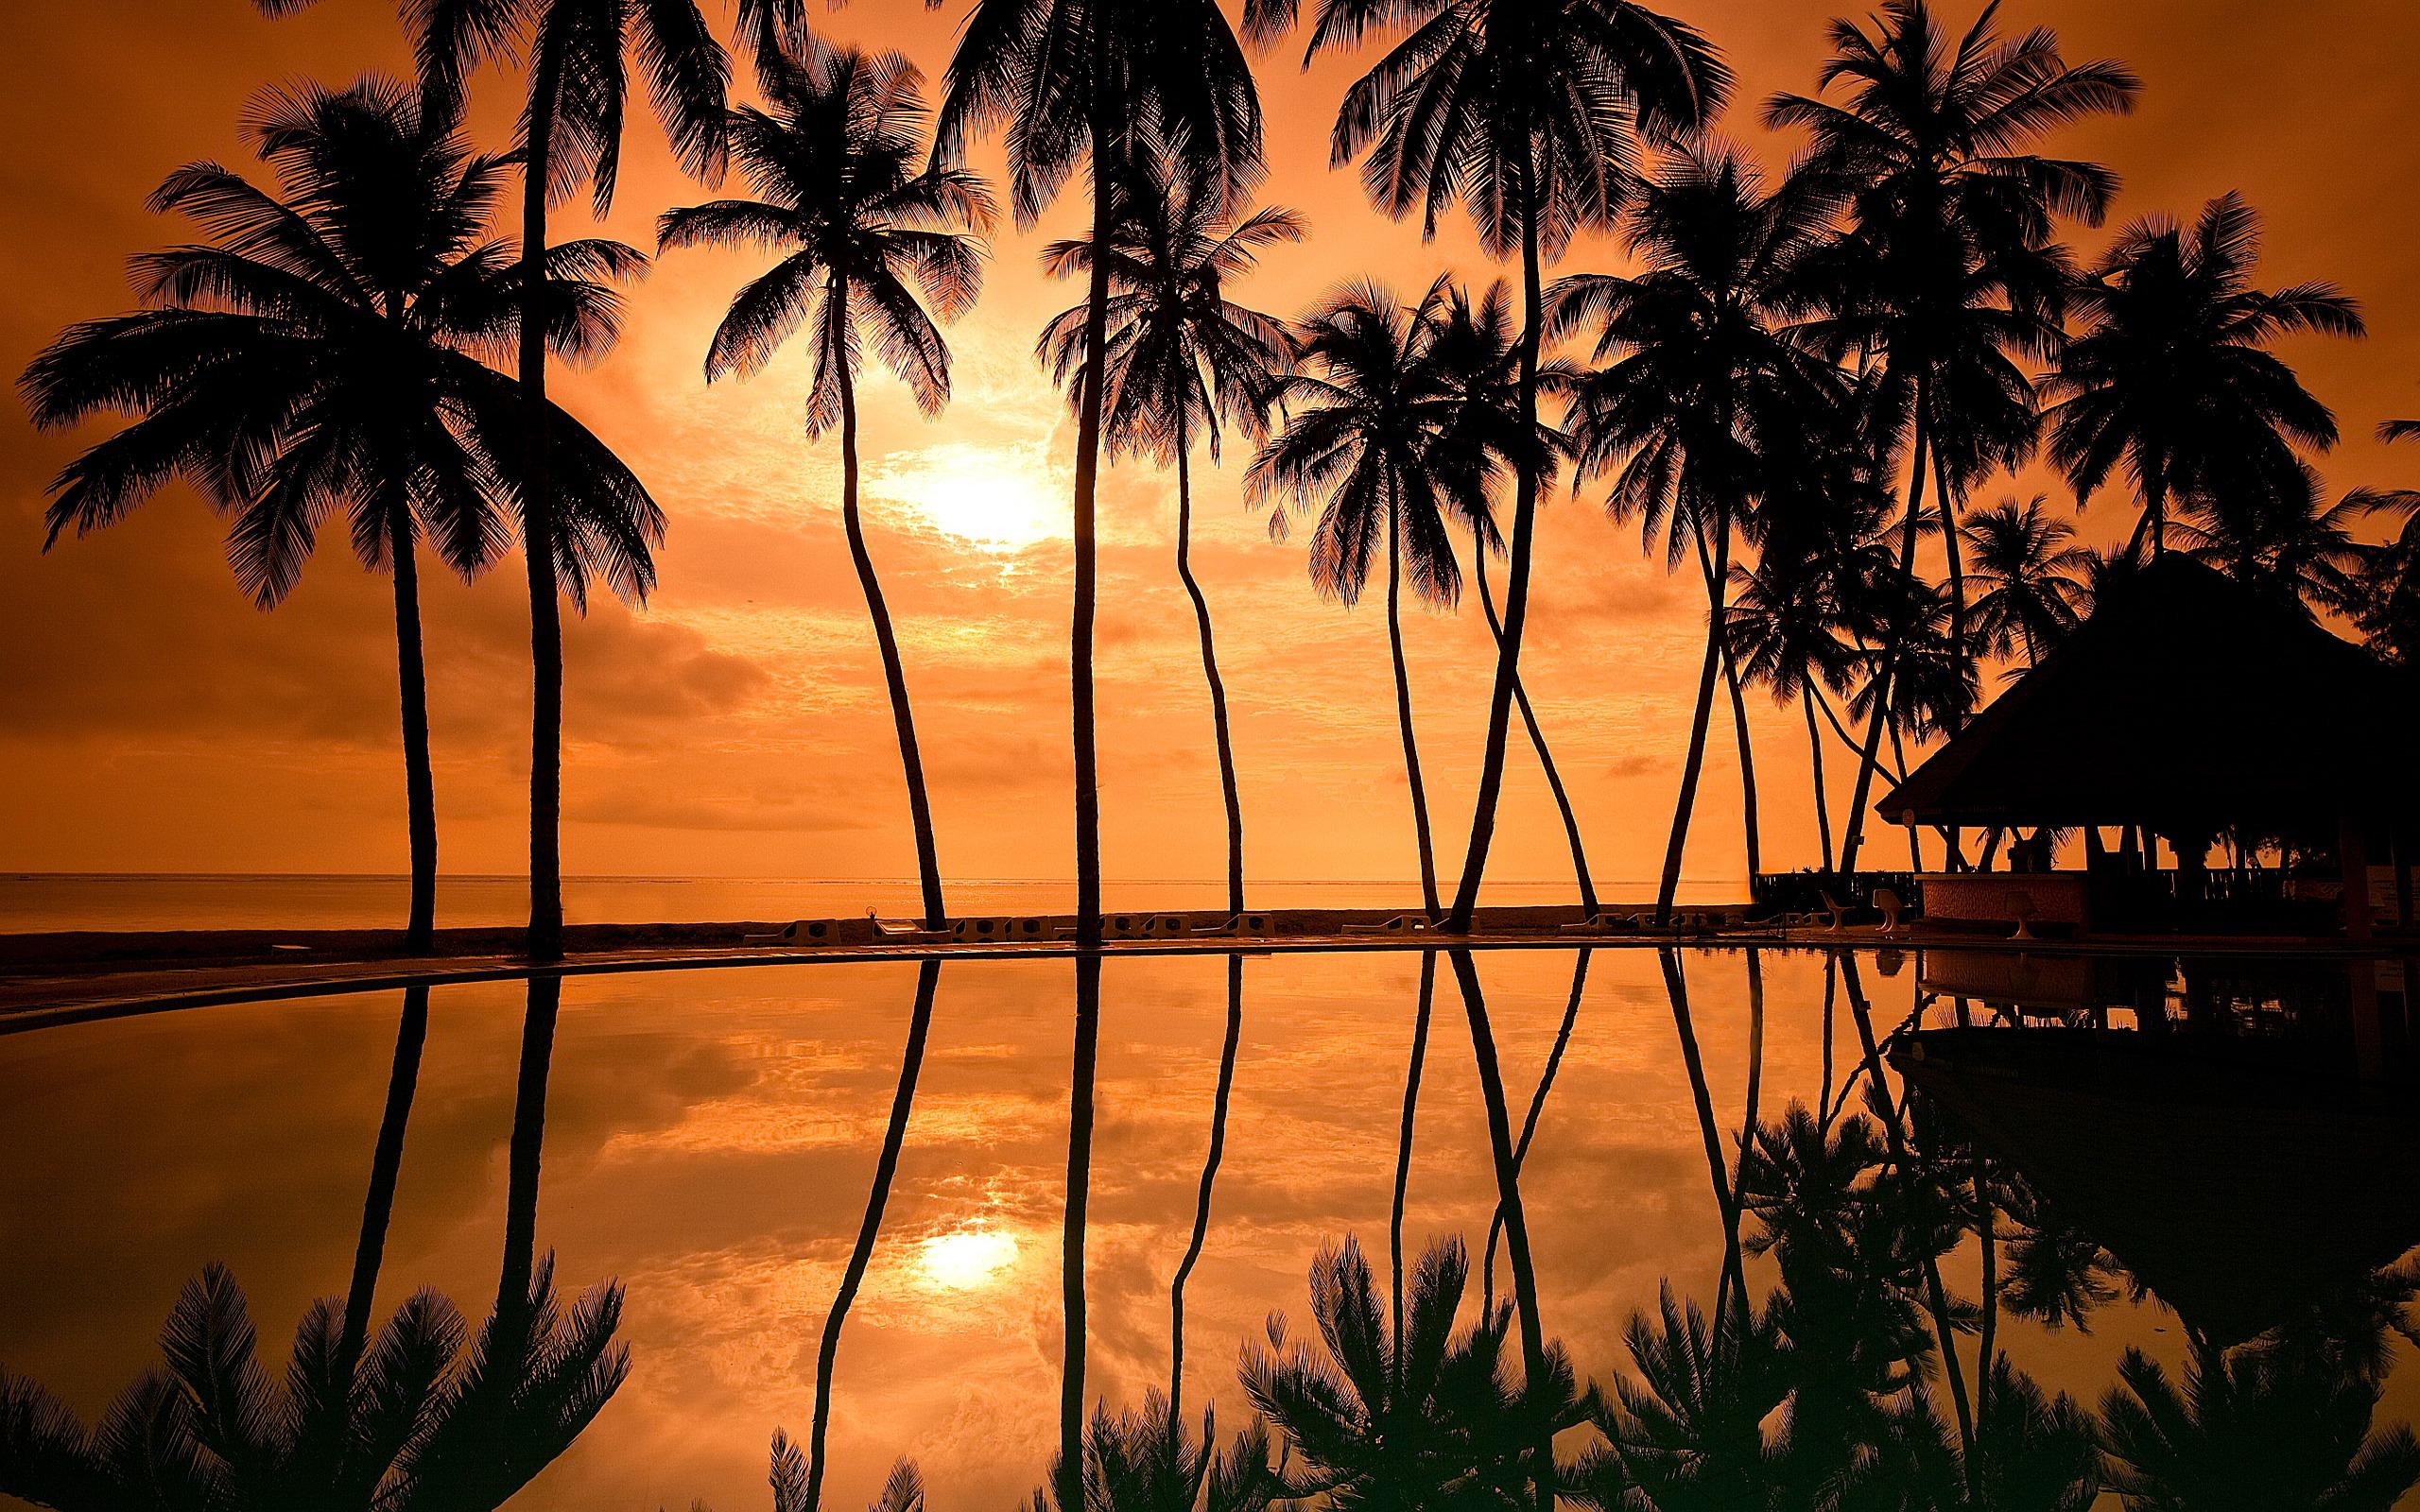 [41+] Hawaii Sunset Wallpapers on WallpaperSafari